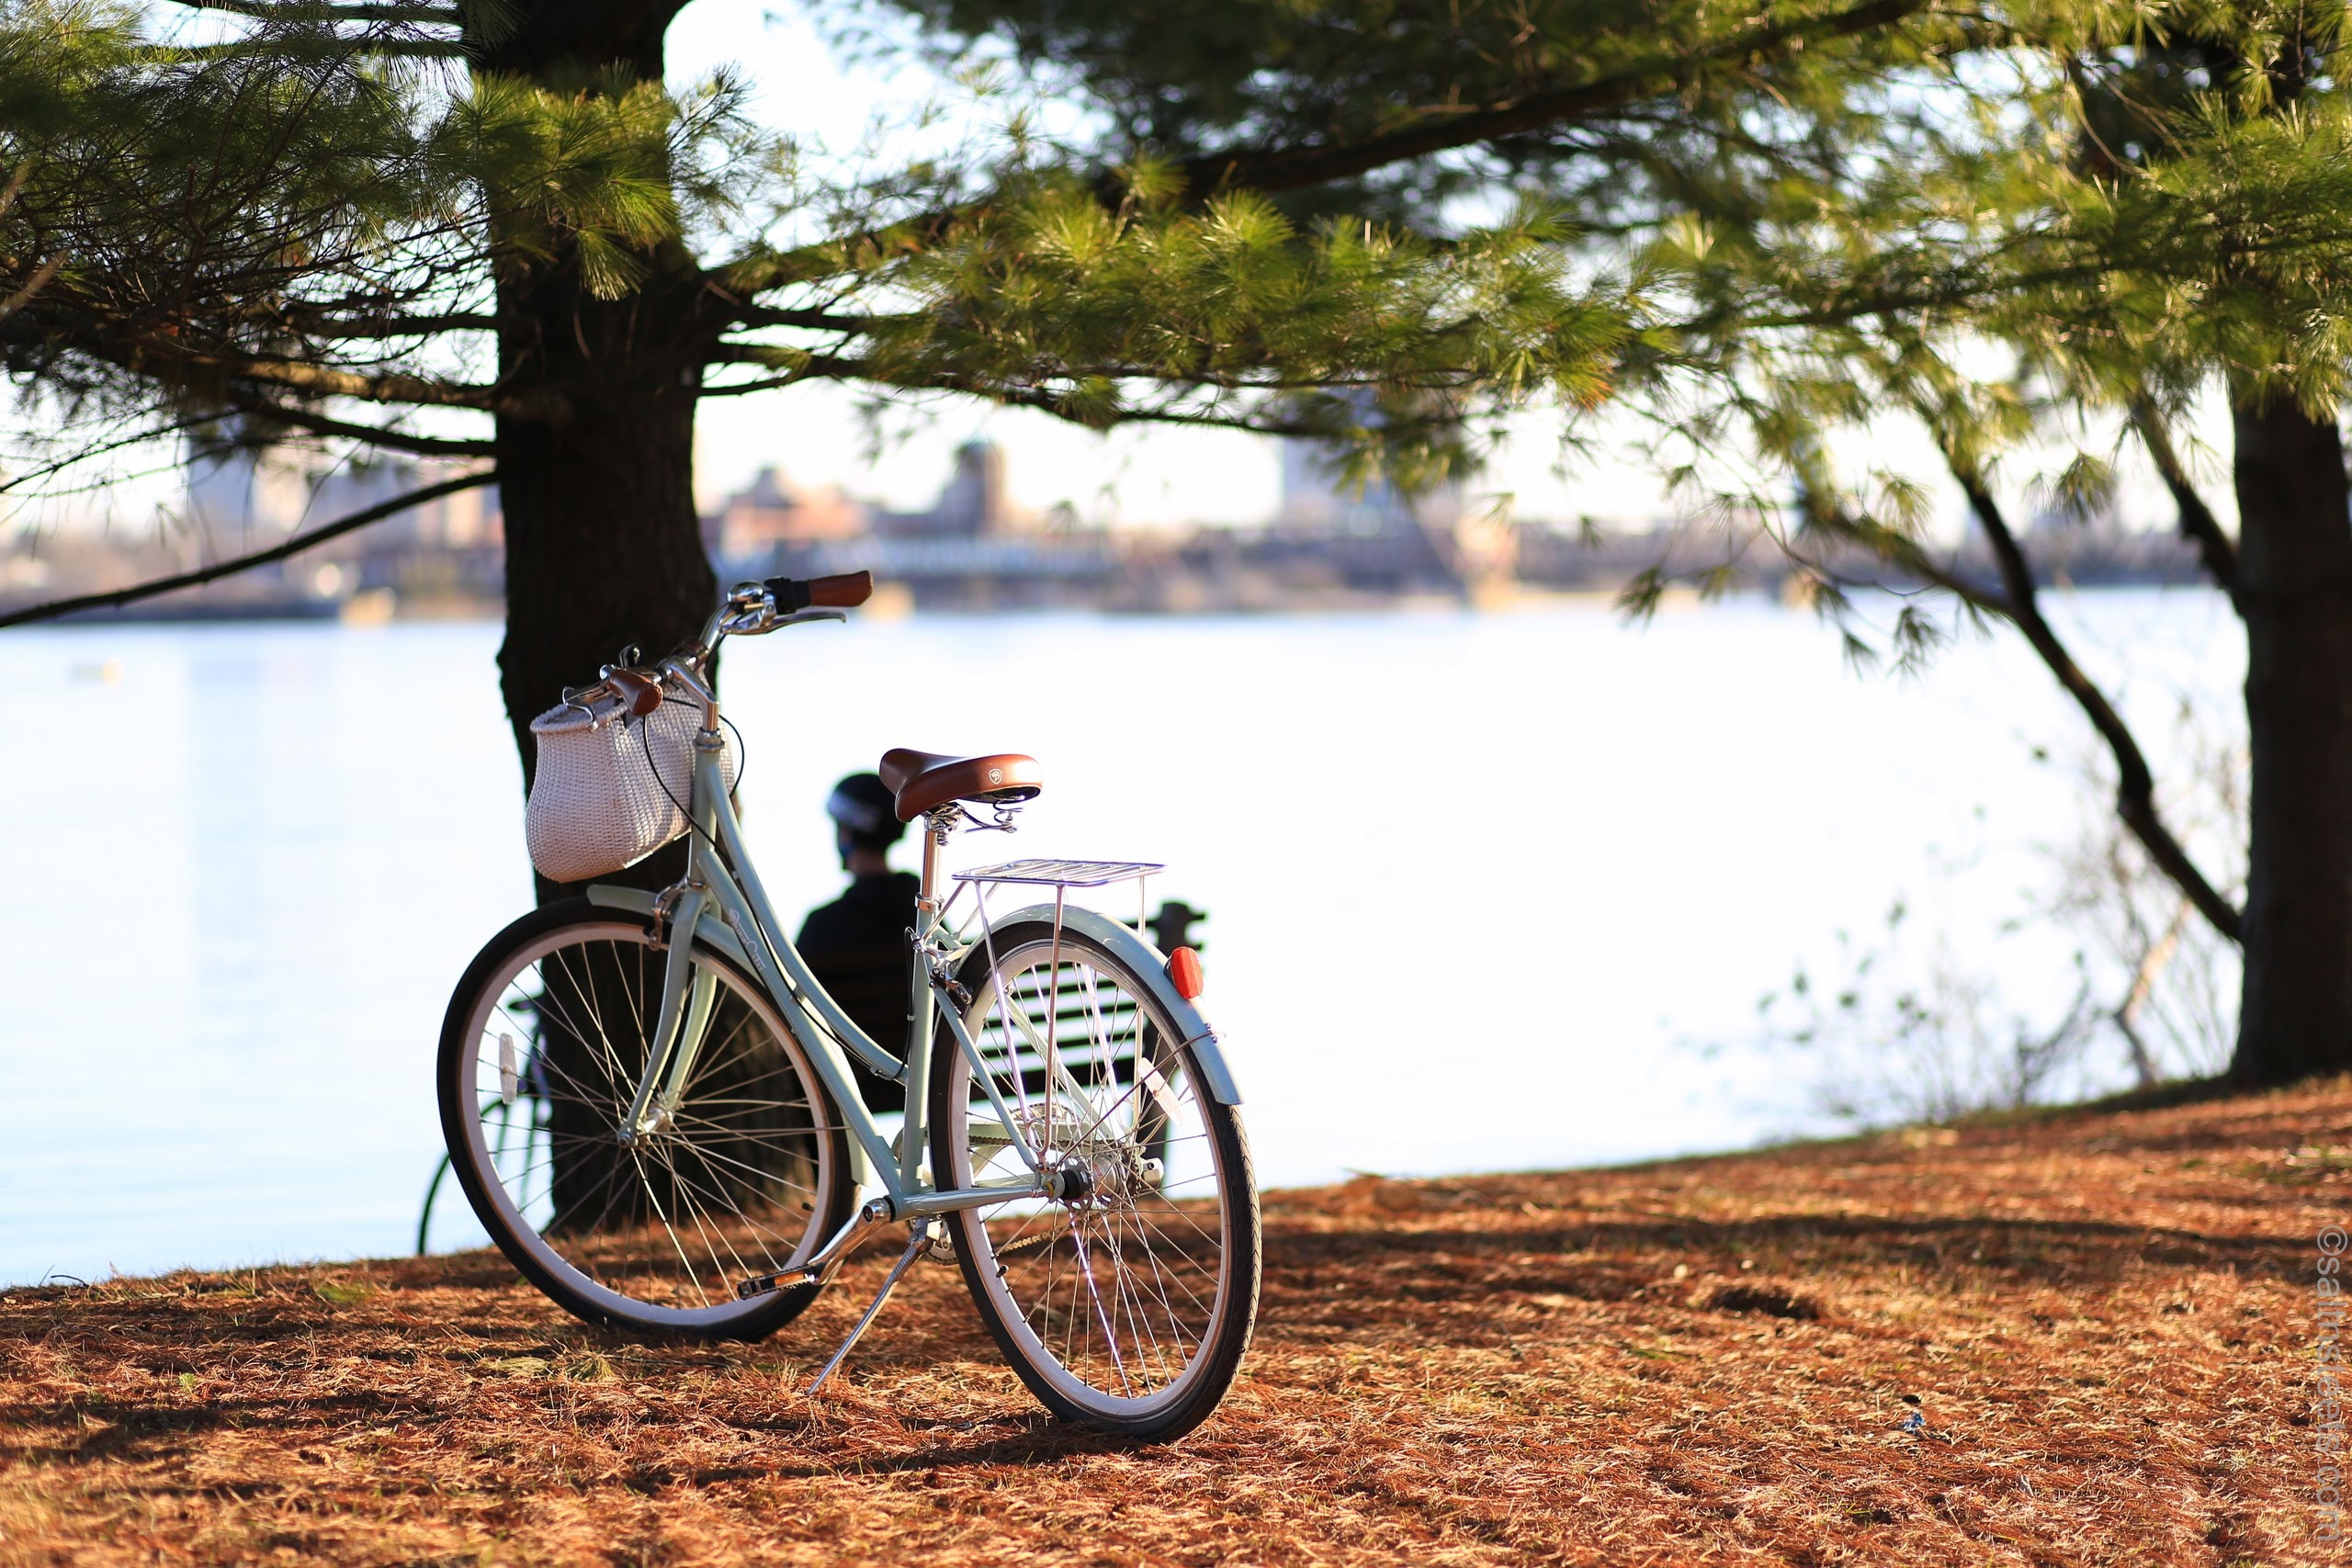 bicycle near tree